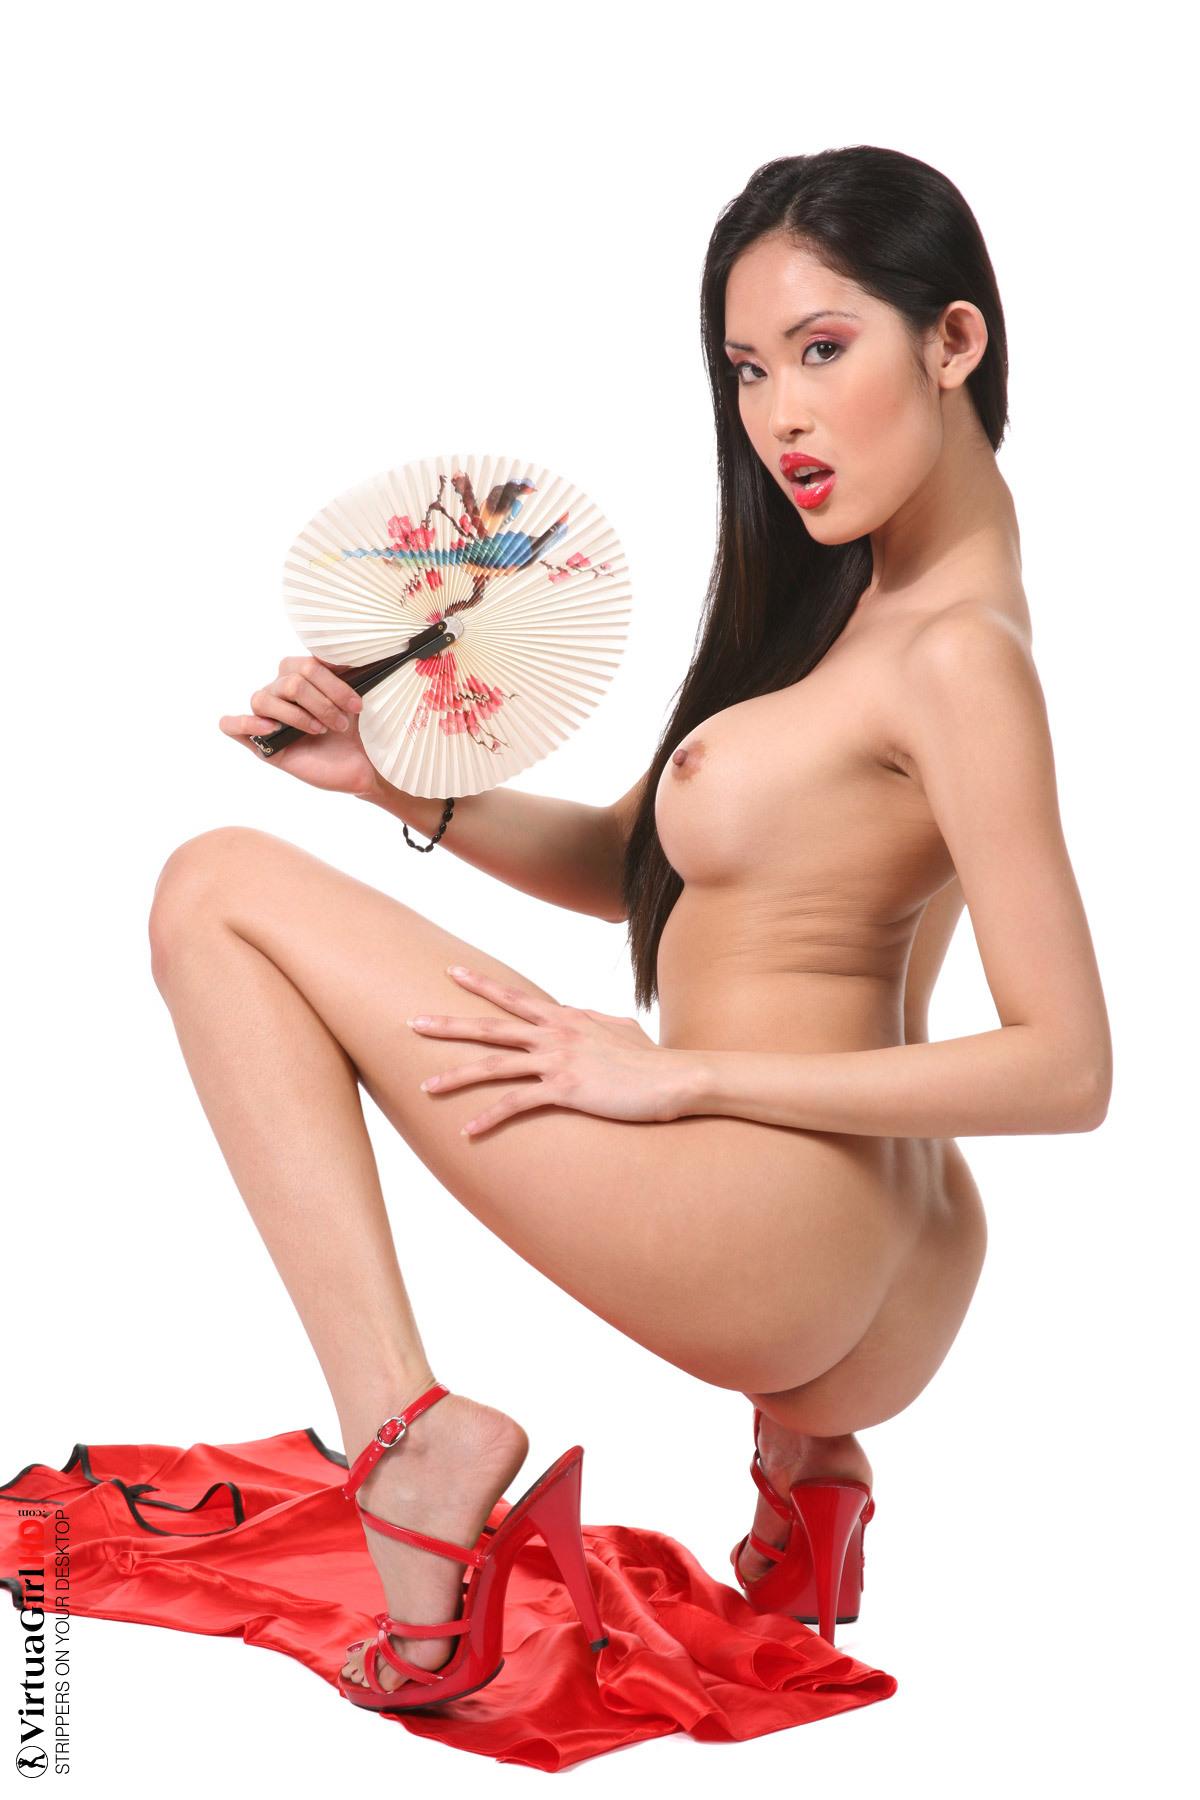 stripping weathee girls